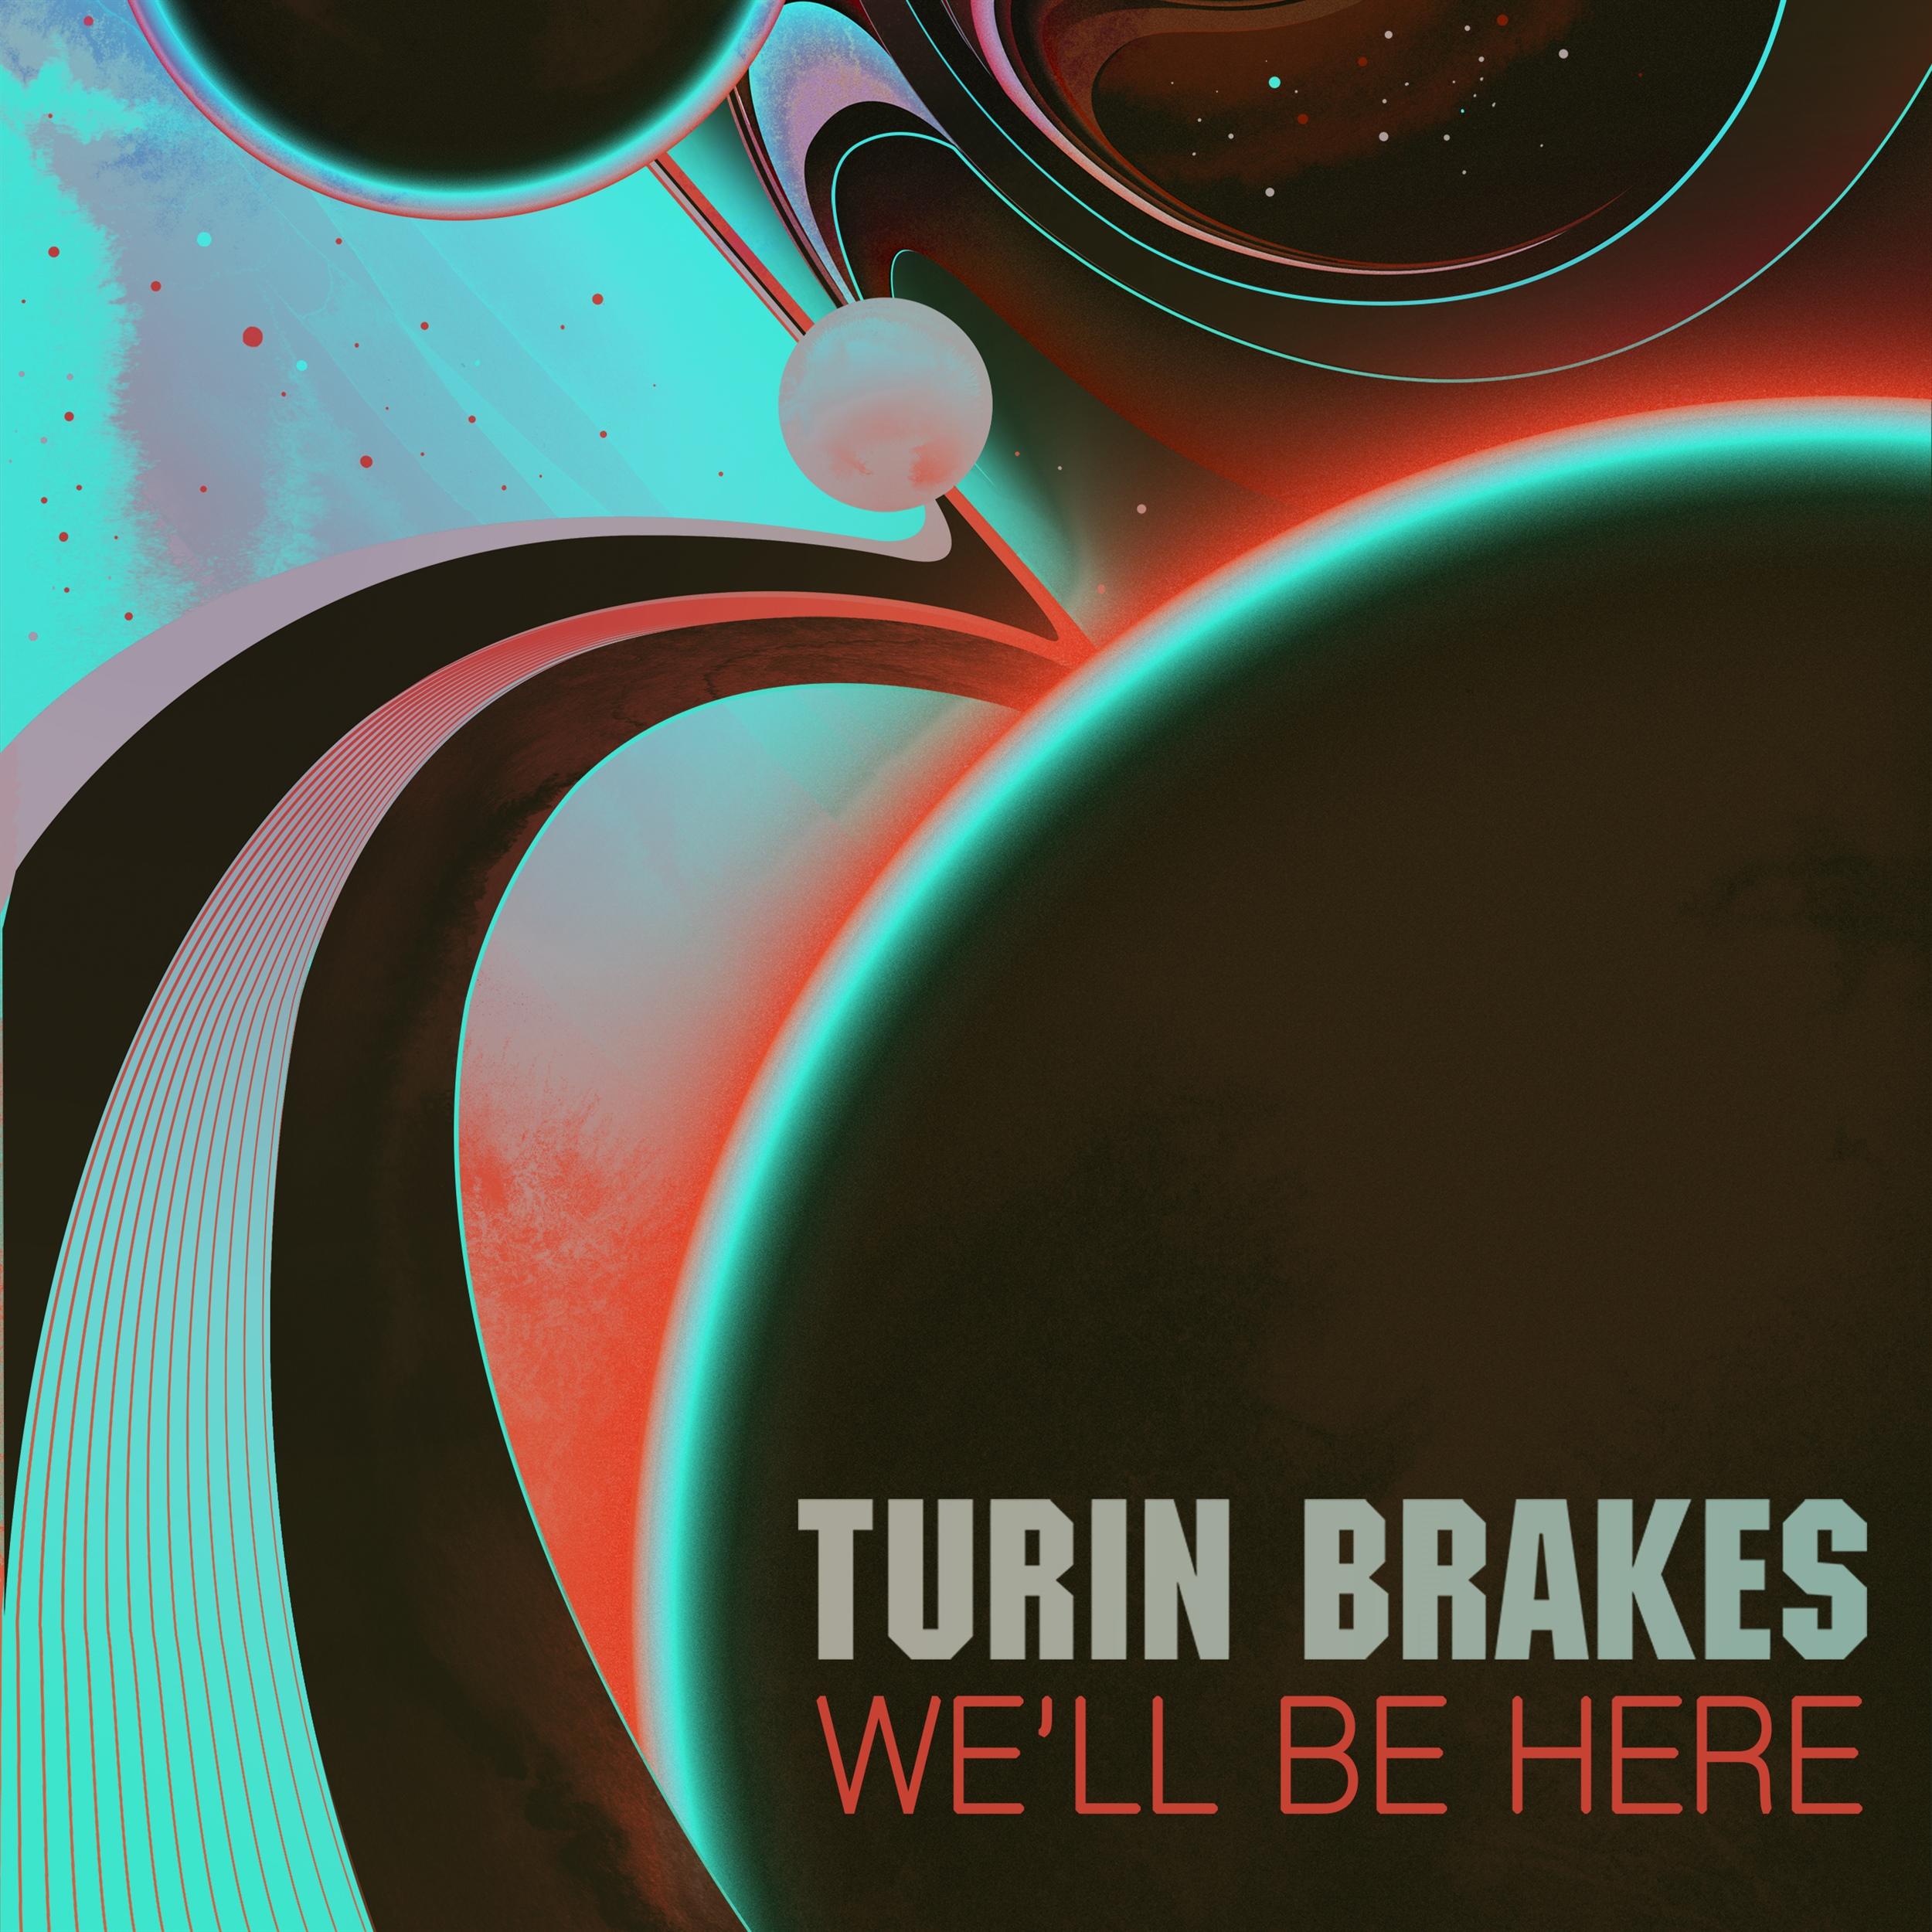 turin brakes we were here chords - photo#2